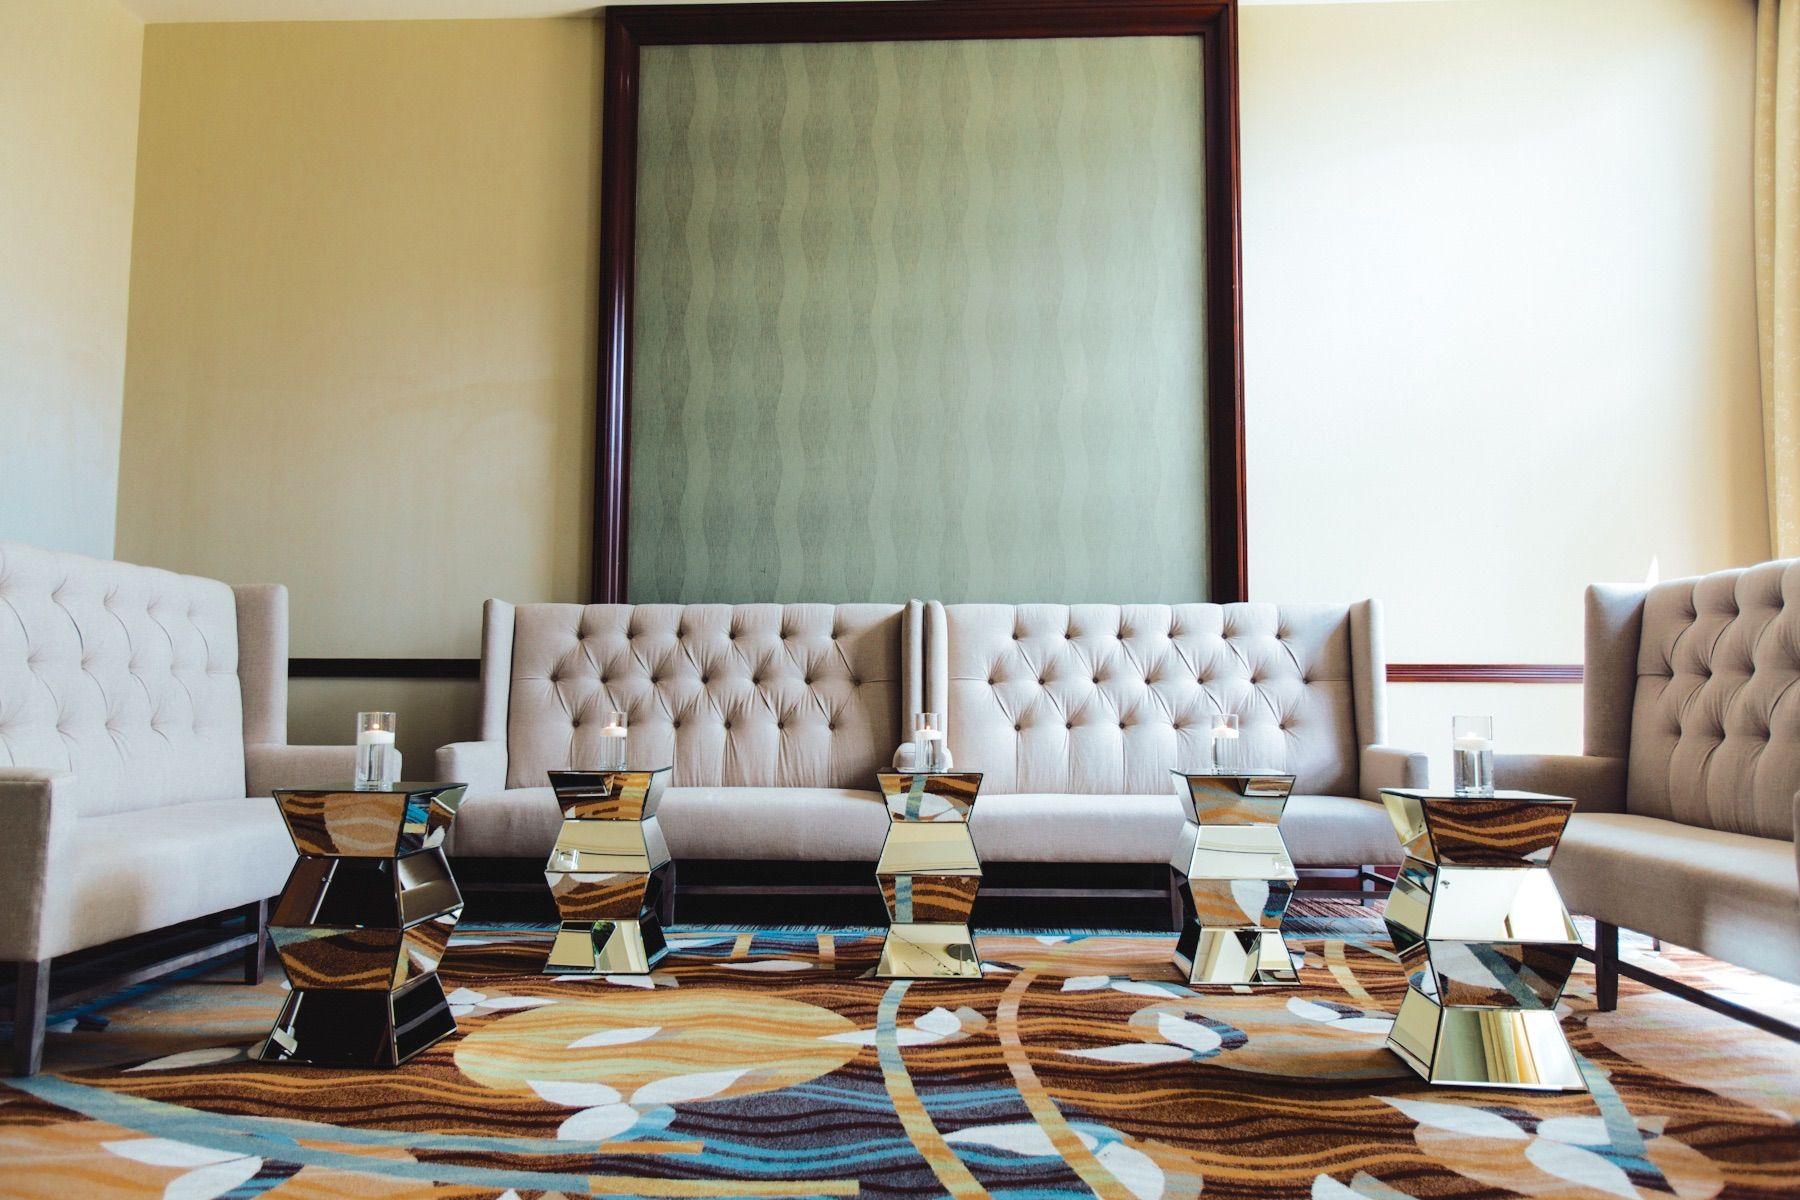 Modern chic style art deco mirror wedding reception space